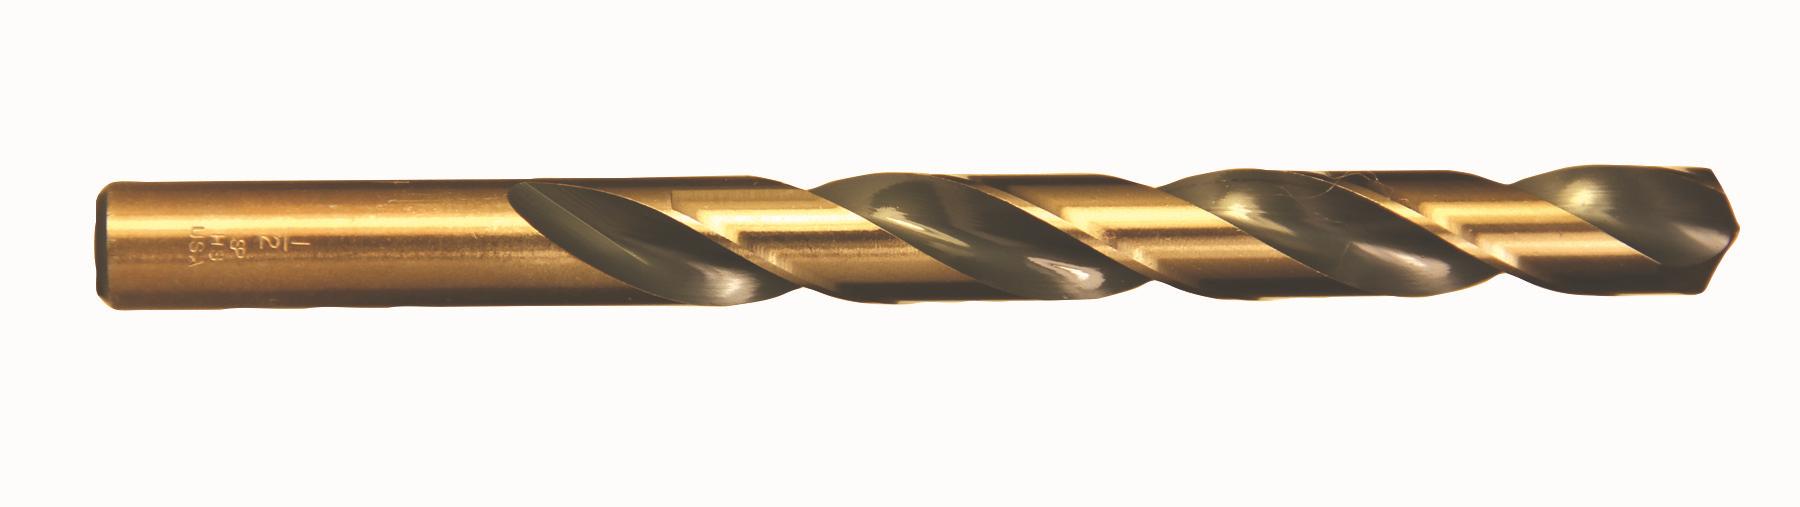 drill-190-GF-jobber-length-norseman-ctd-specialty-supply-company